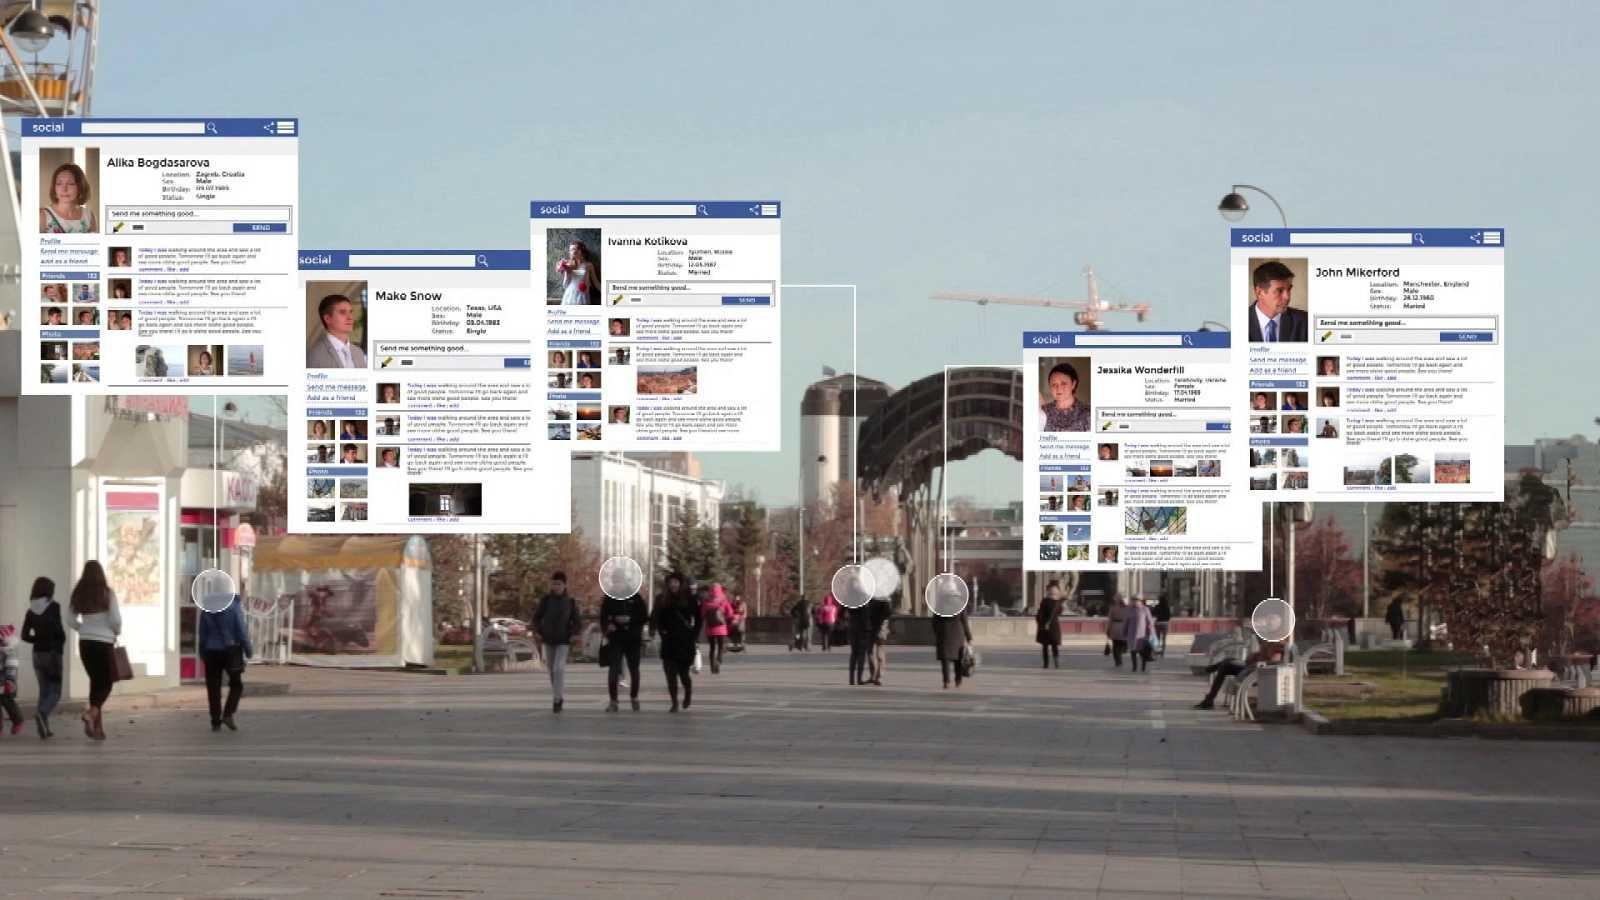 Facebook, noticias falsas